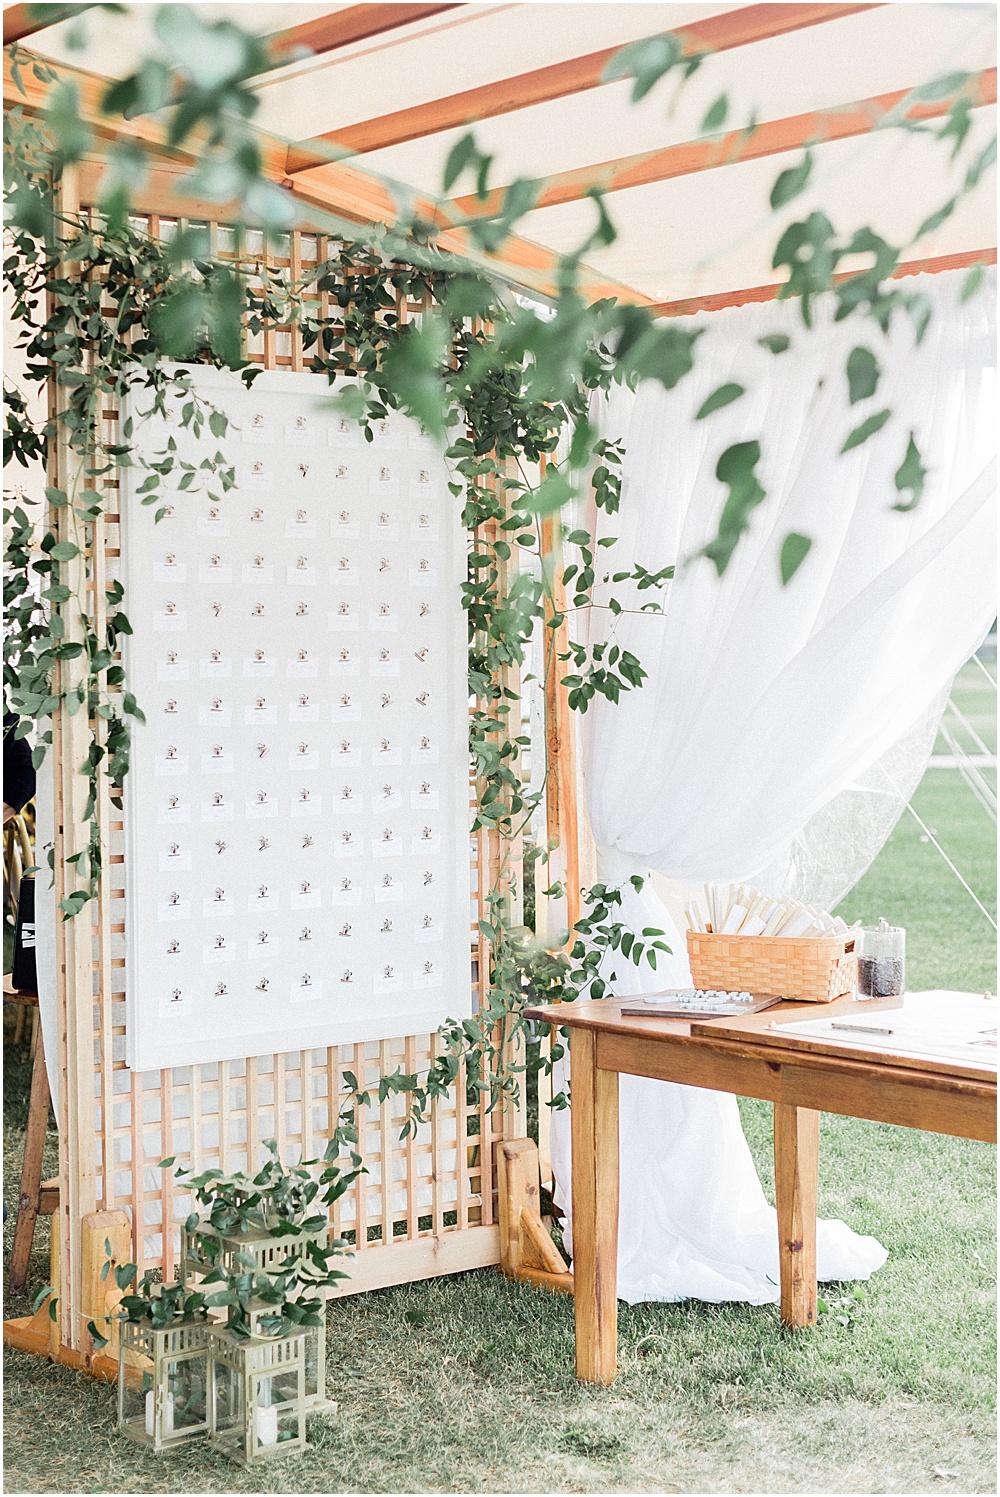 tabor_academy_rebecca_chris_tented_interior_trees_engagement_session_cape_cod_massachusetts_boston_wedding_photographer_meredith_jane_photography_photo_0721.jpg